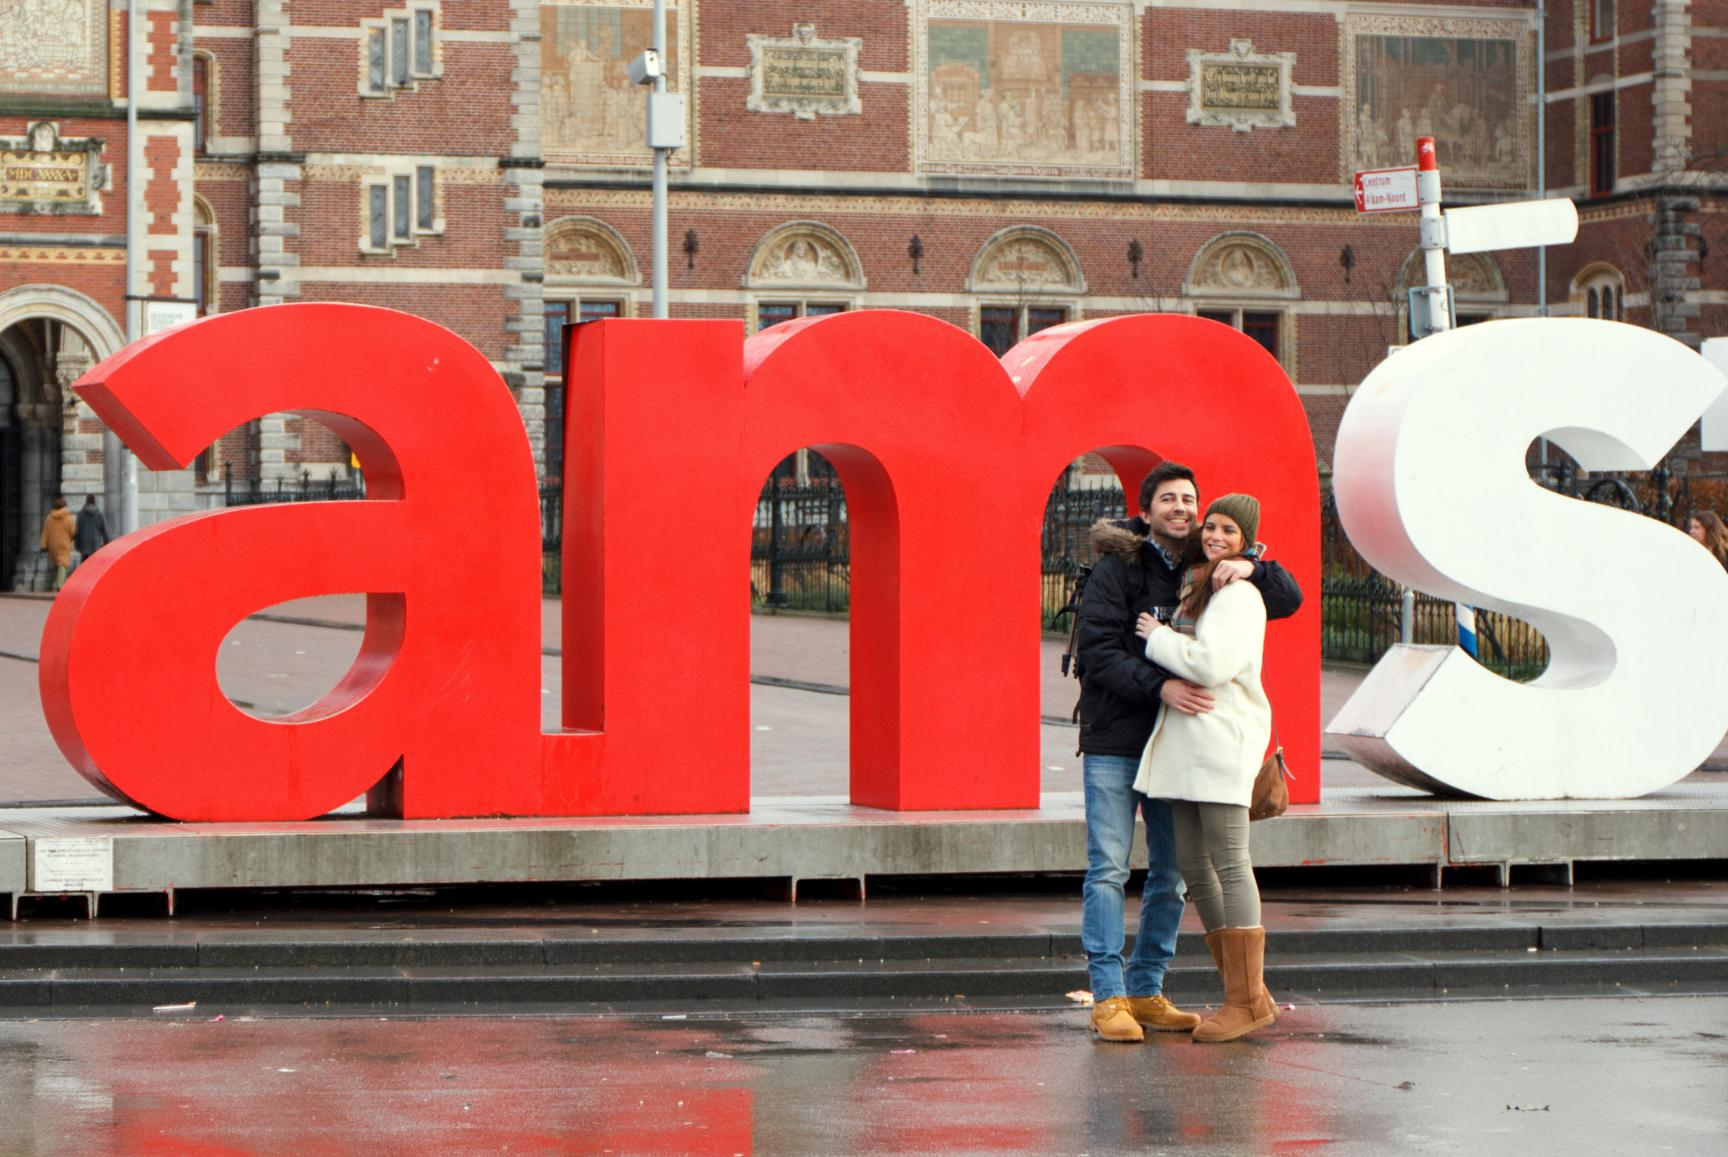 letras-i-amsterdam-1